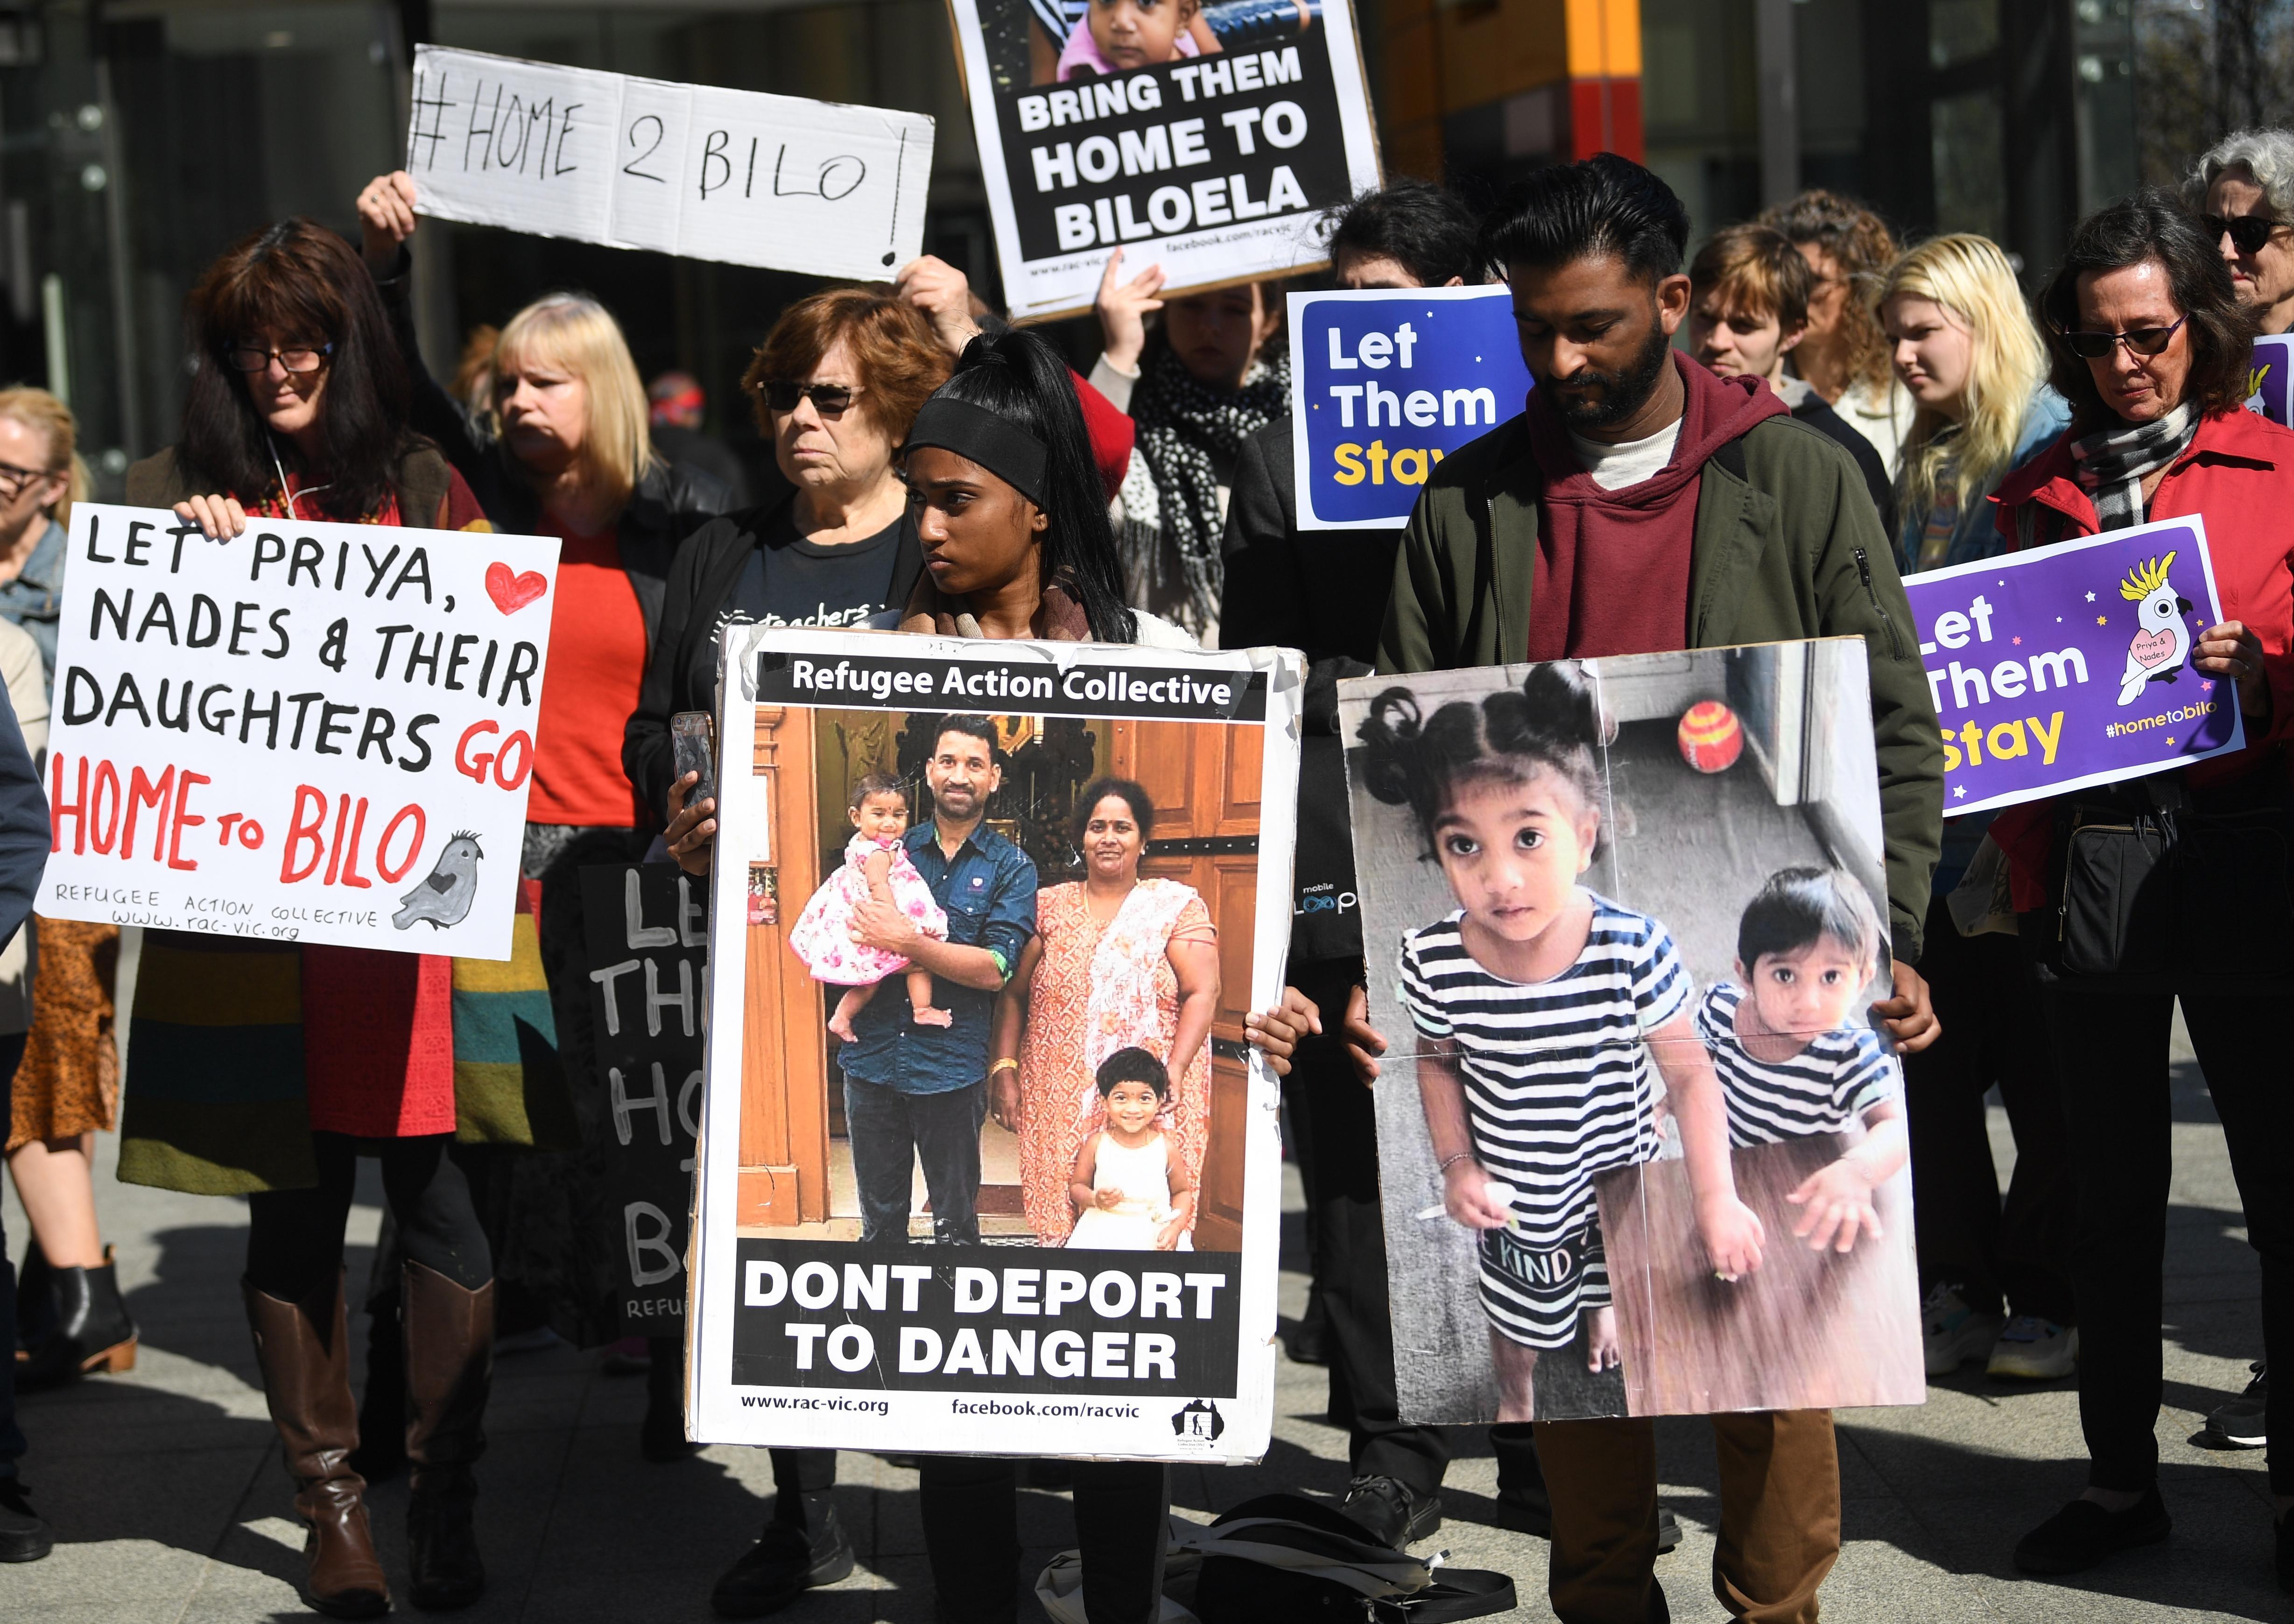 Biloela Tamil family deportation case: asylum seekers can stay until final hearing